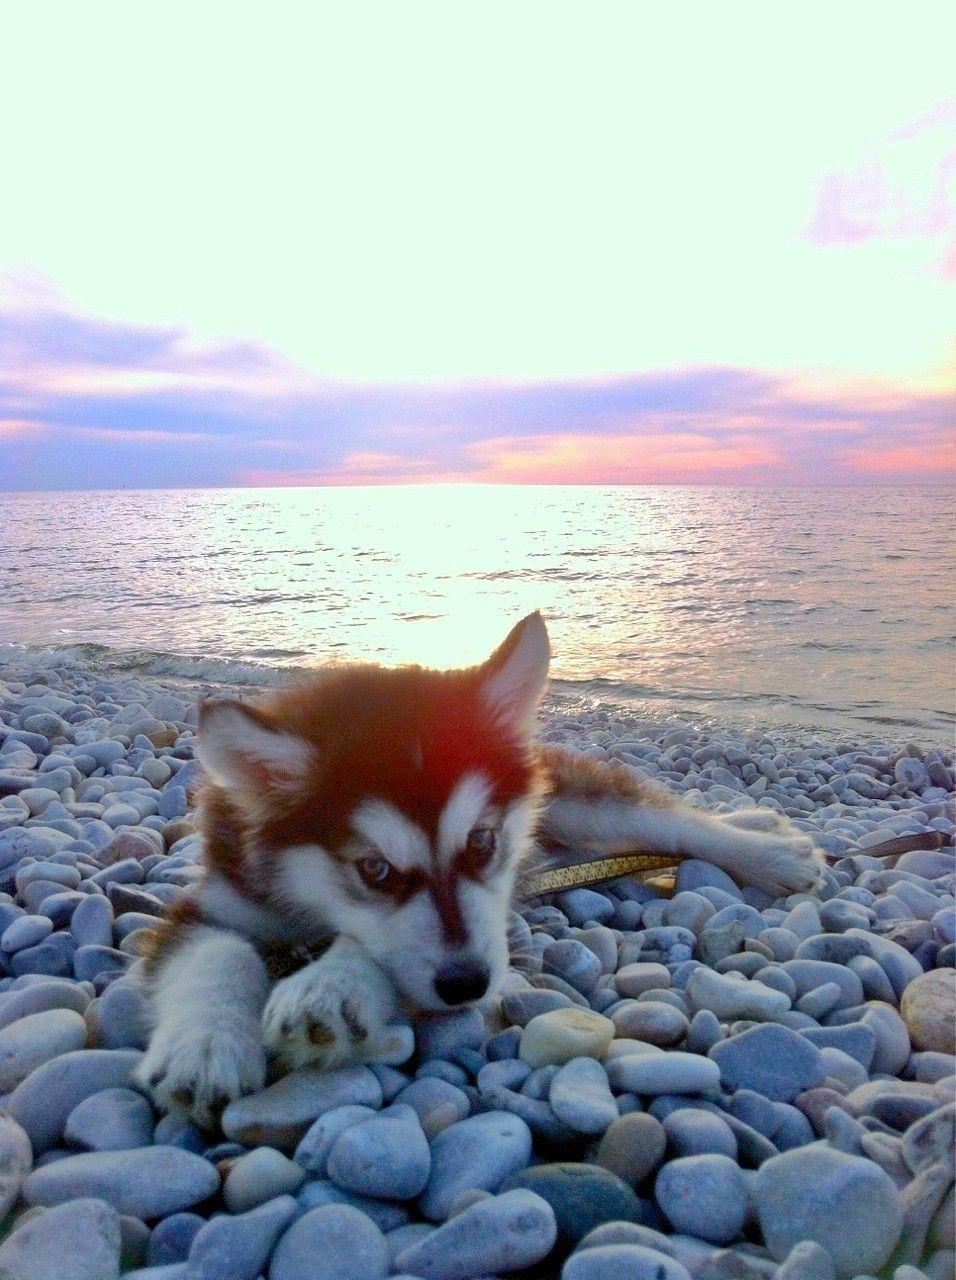 Siberian Husky Puppy Sunset Over Lake Michigan Imgur Siberianhusky Siberianhuskypuppy Siberian Husky Husky Puppy Siberian Husky Puppy